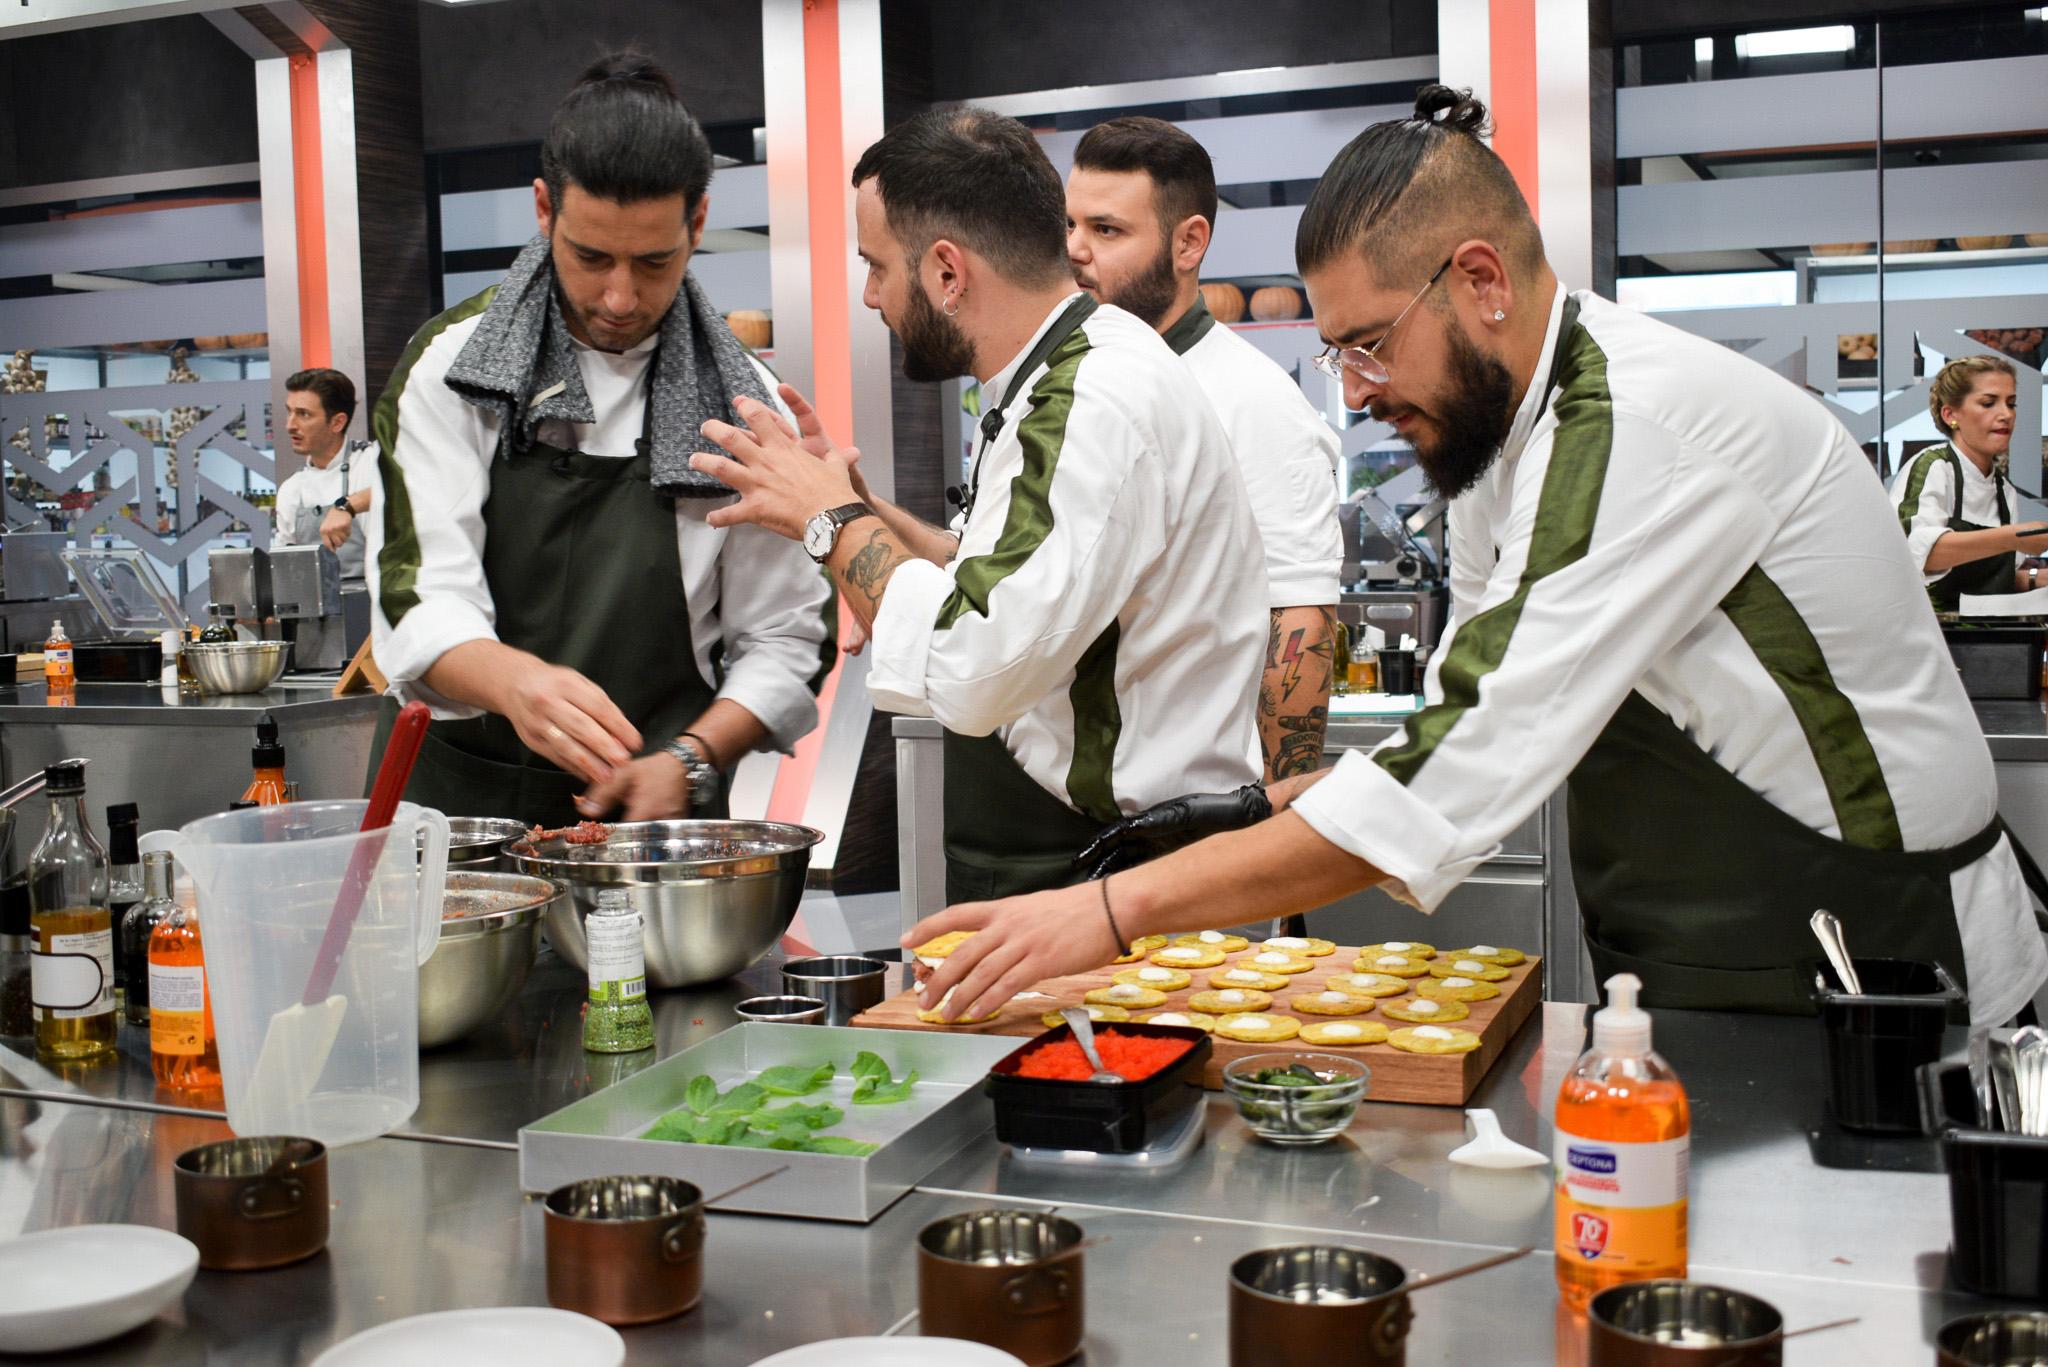 Game Of Chefs: Οι λεπτομέρειες κάνουν τη διαφορά – Δύσκολη η απόφαση για τους κριτές